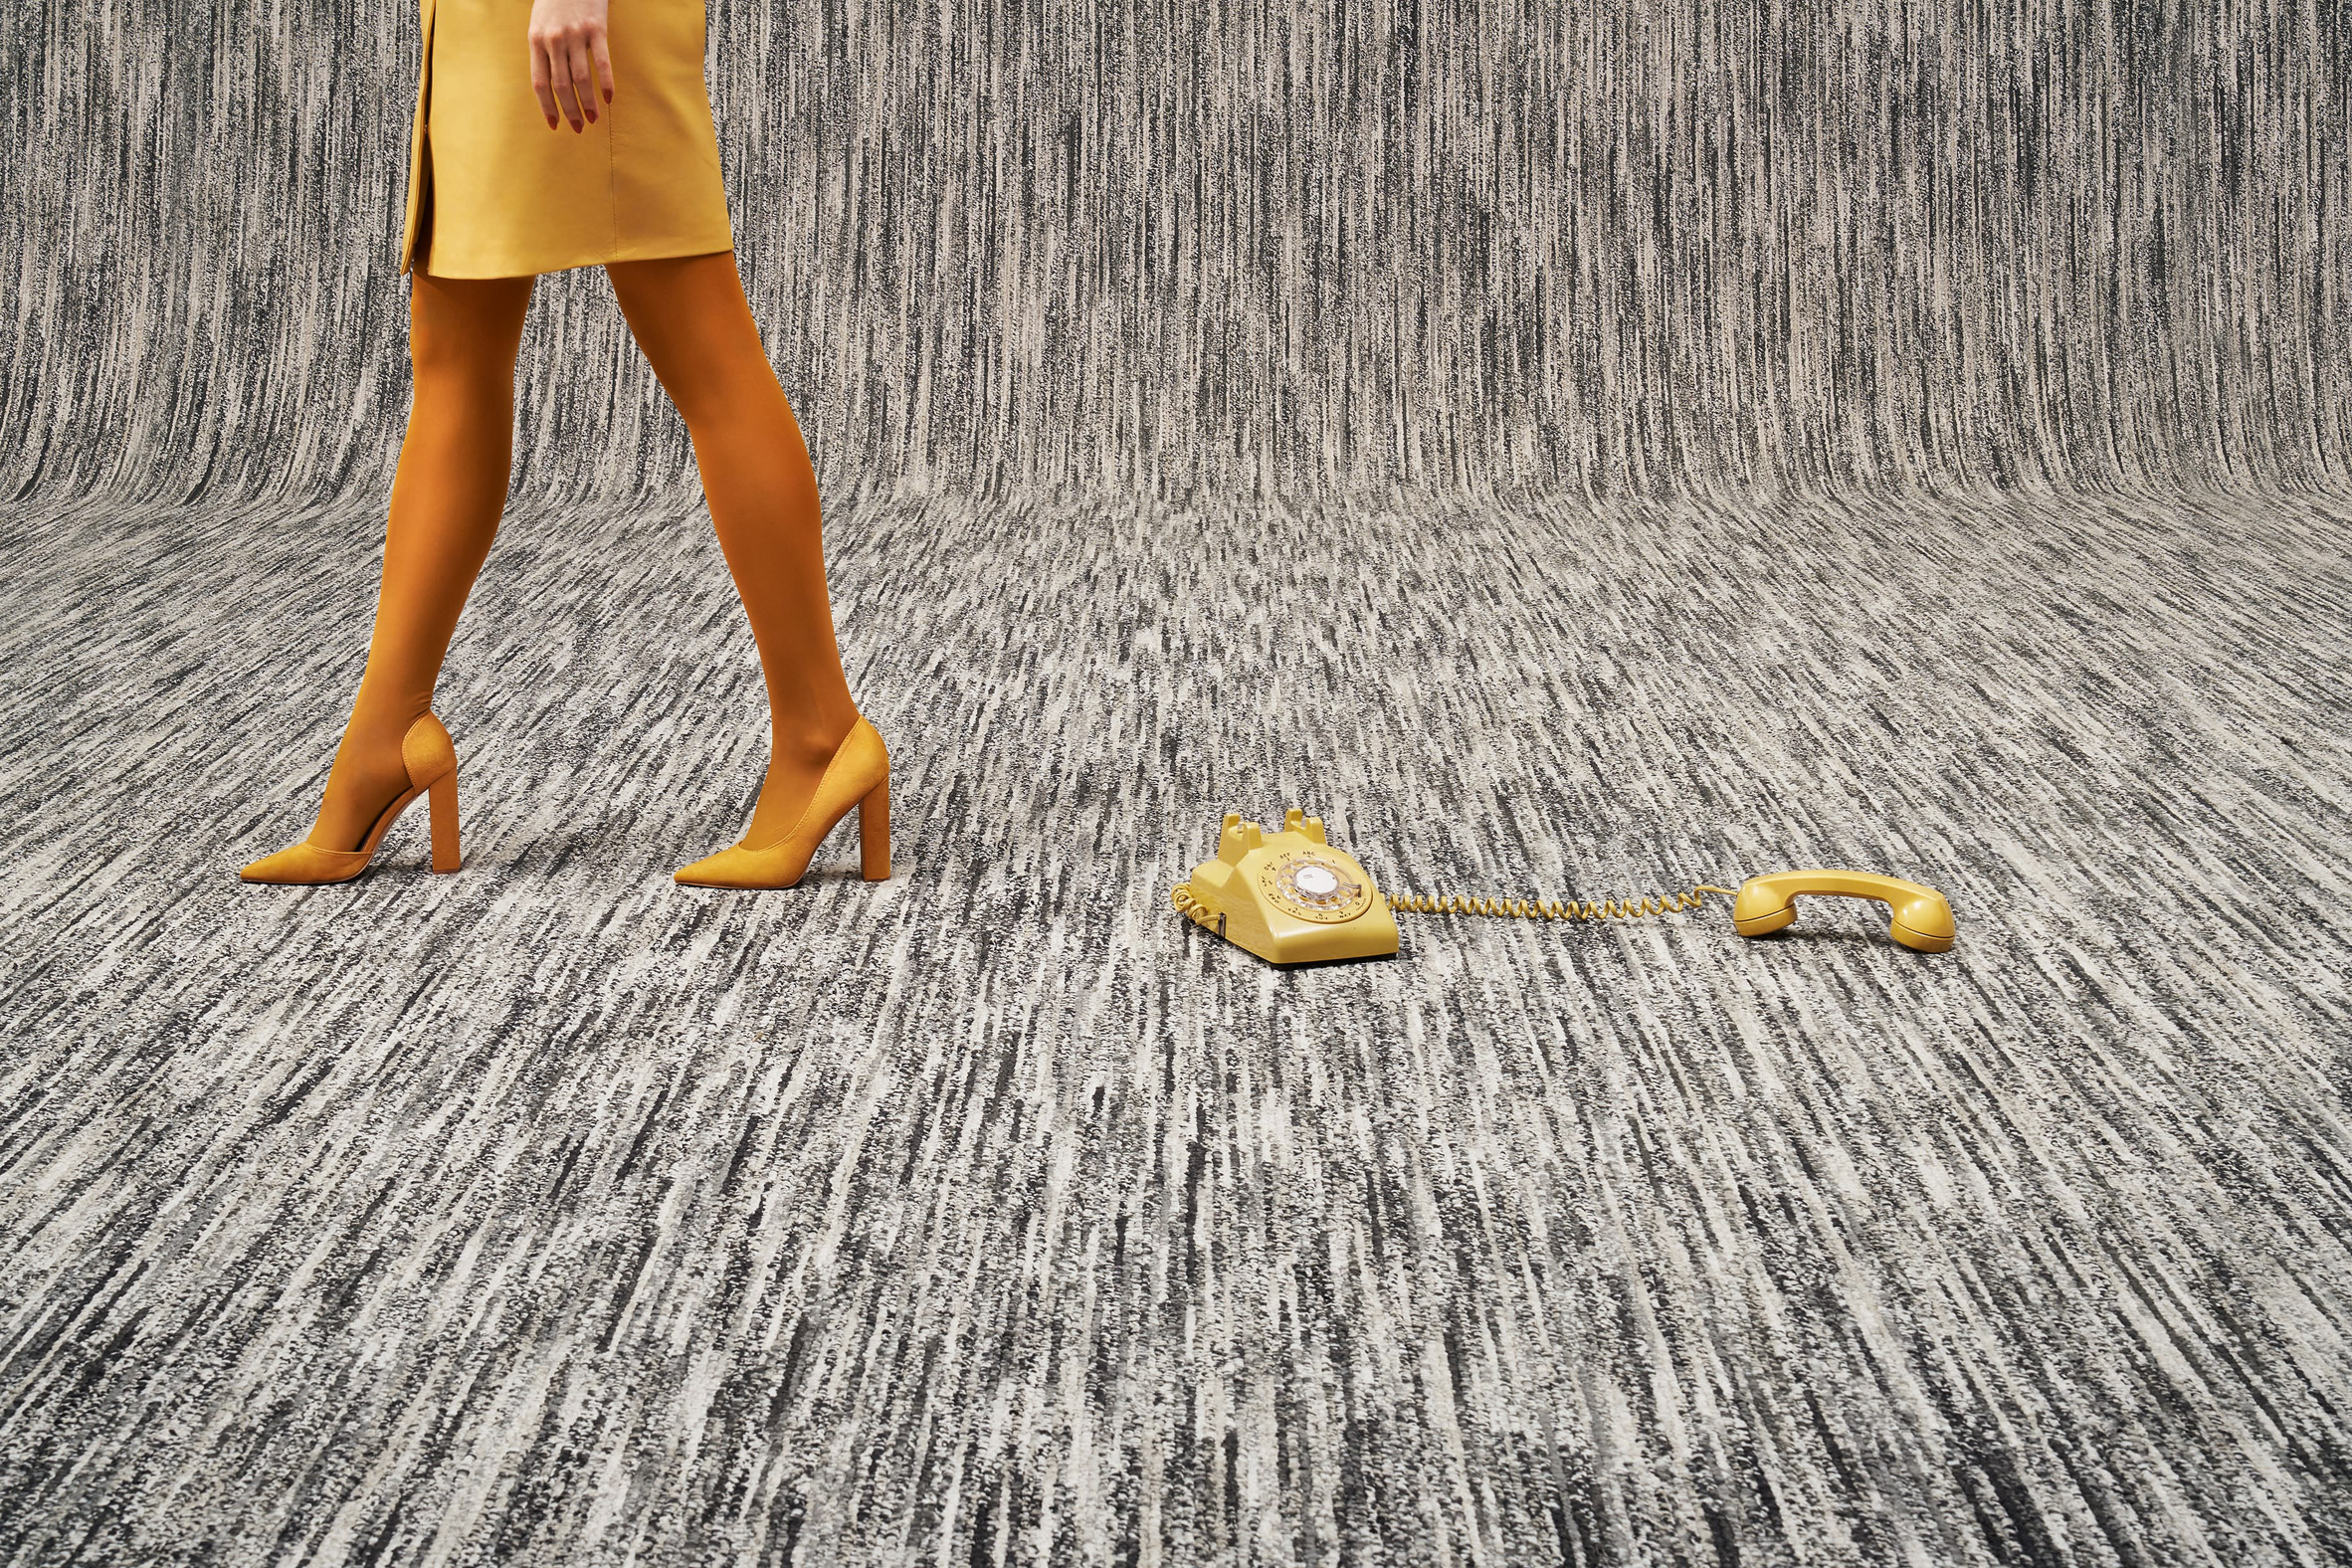 MEET × BEAT carpet by Ippolito Fleitz Group for Object Carpet